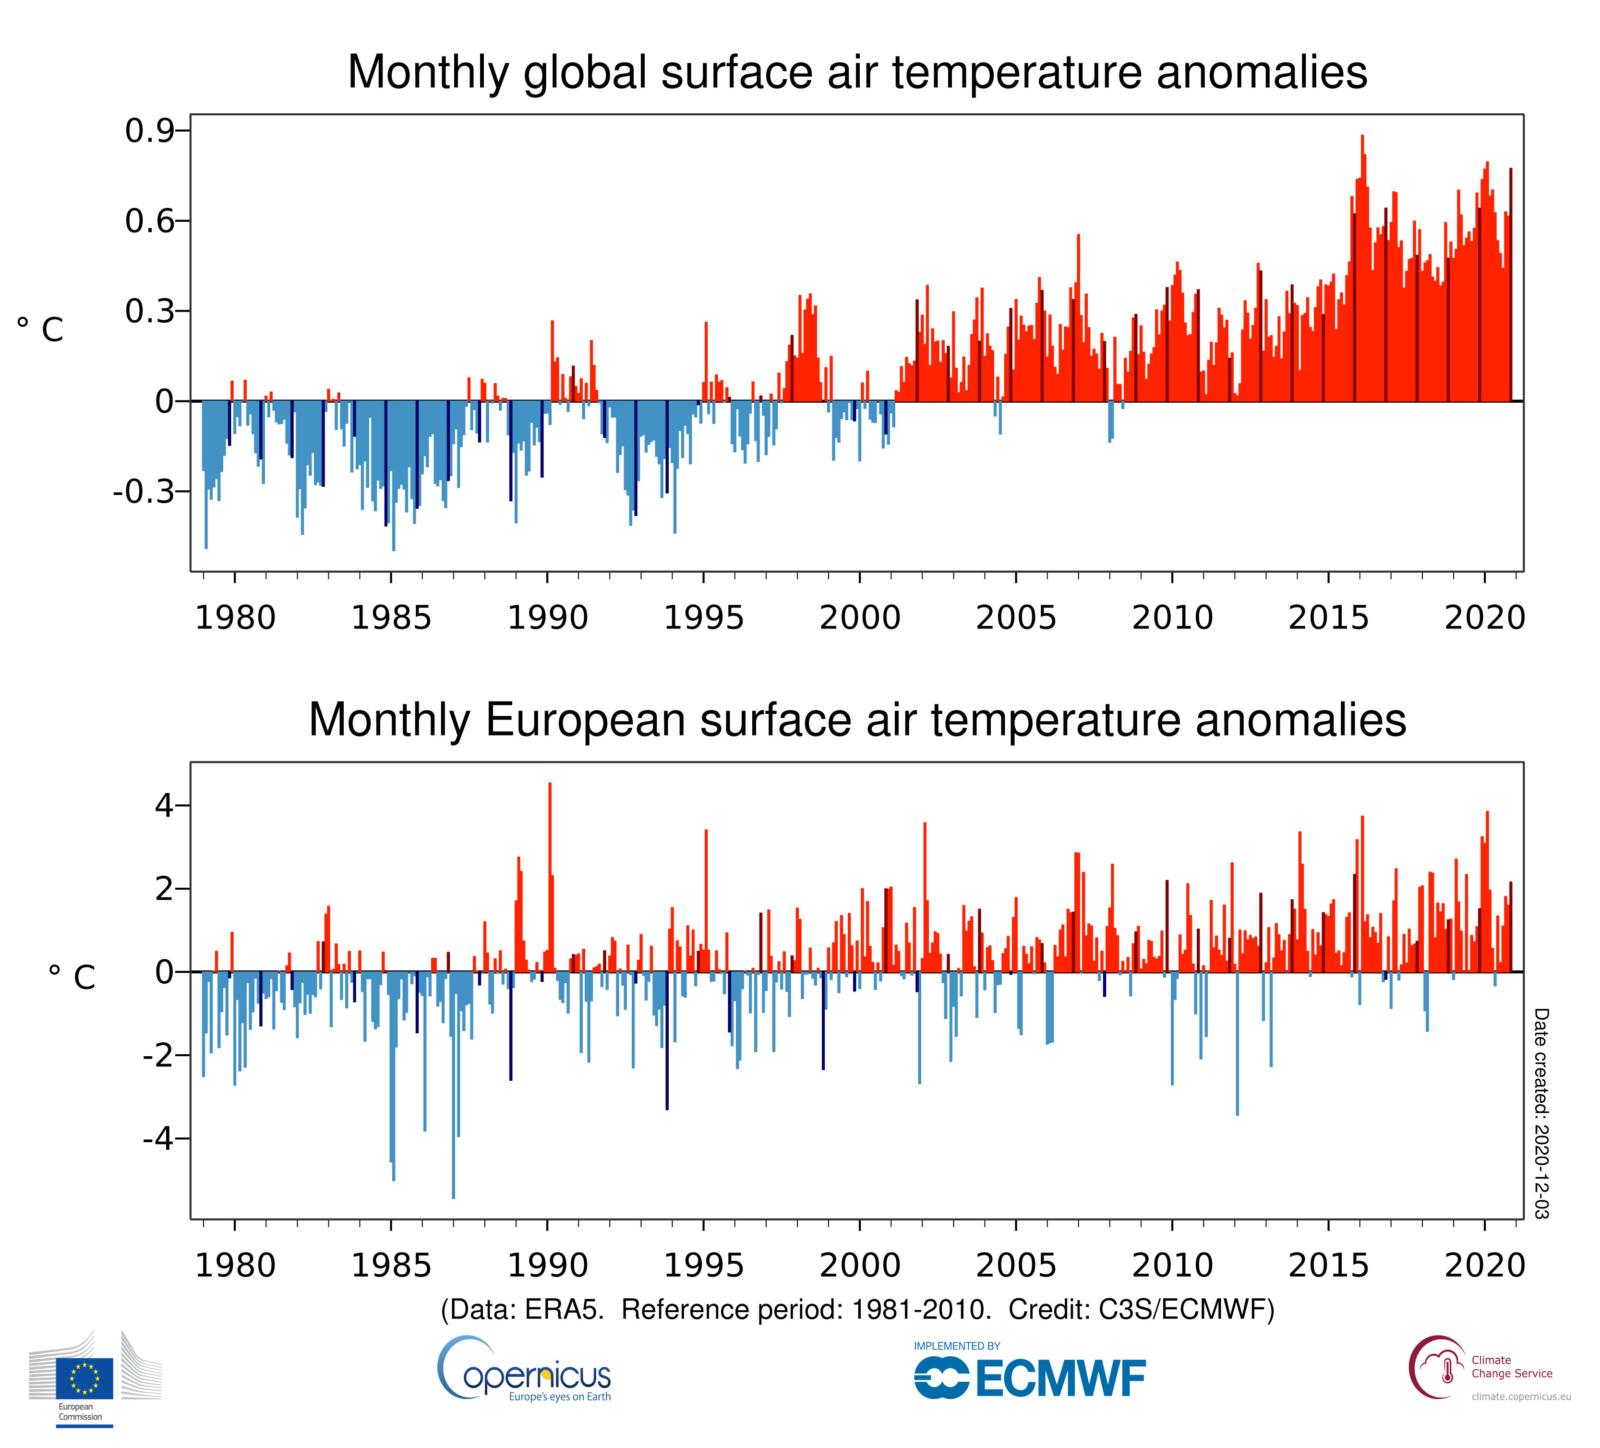 ts 1month anomaly Global ERA5 2T 202011 v01